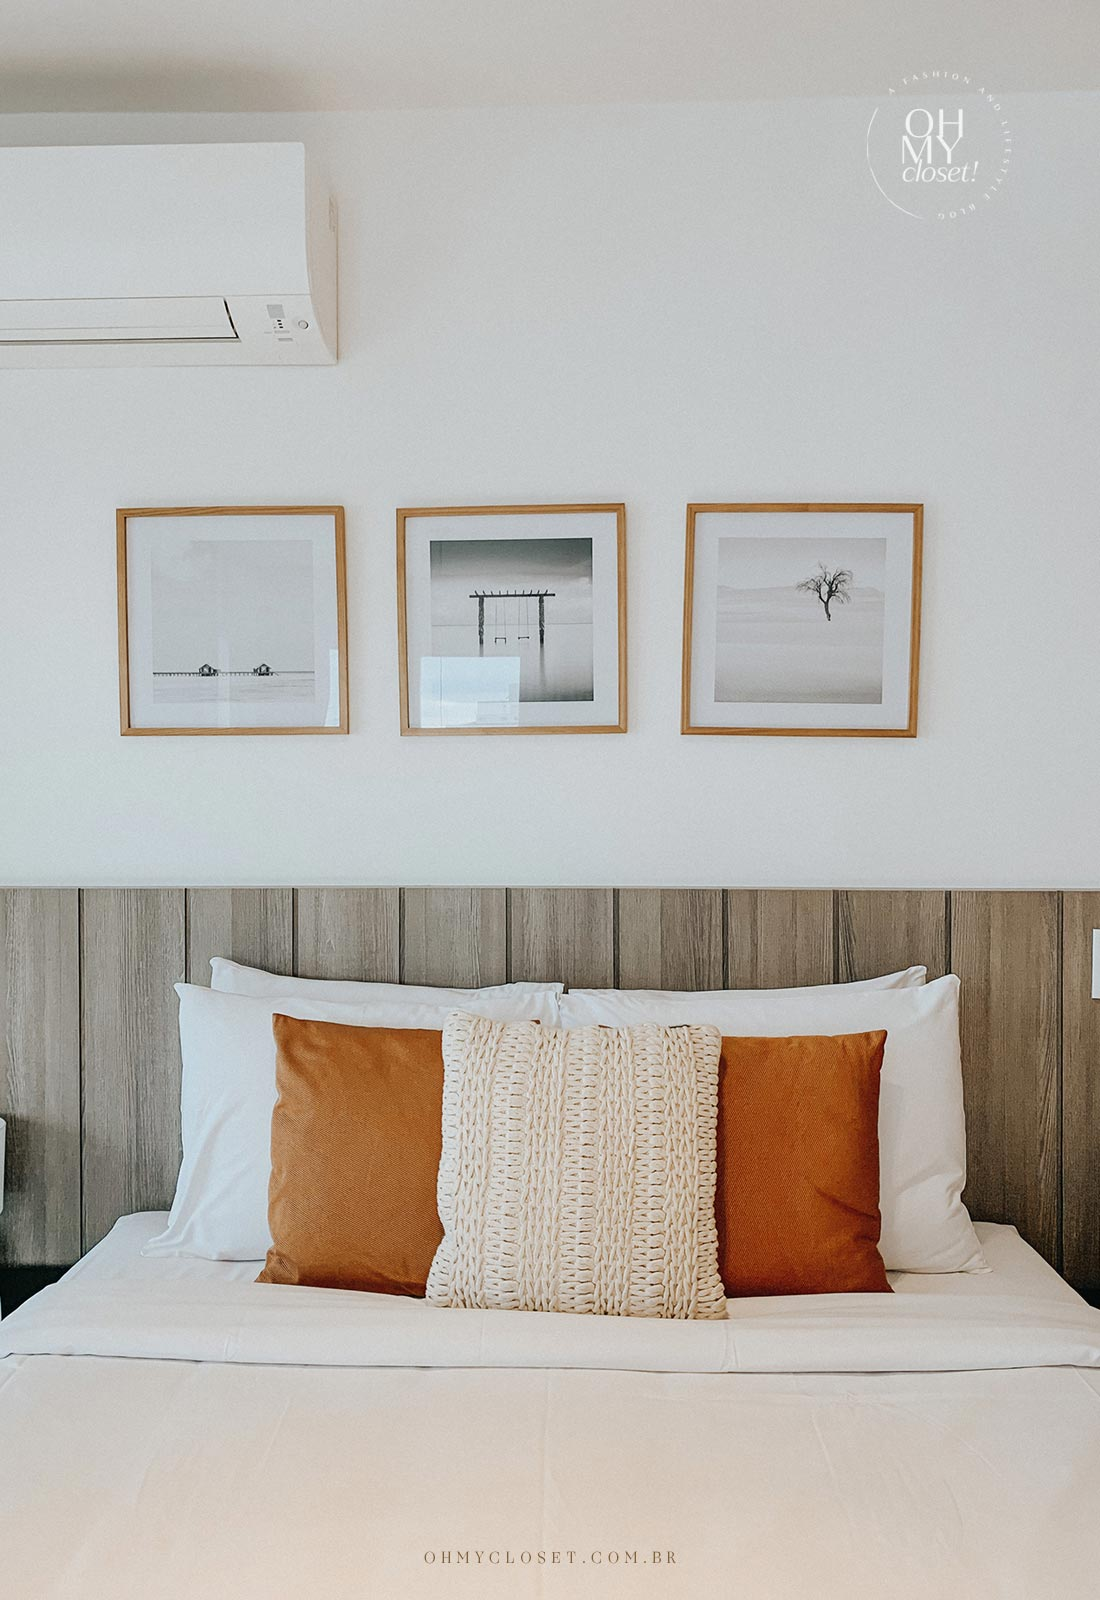 Cama, Airbnb São Paulo.